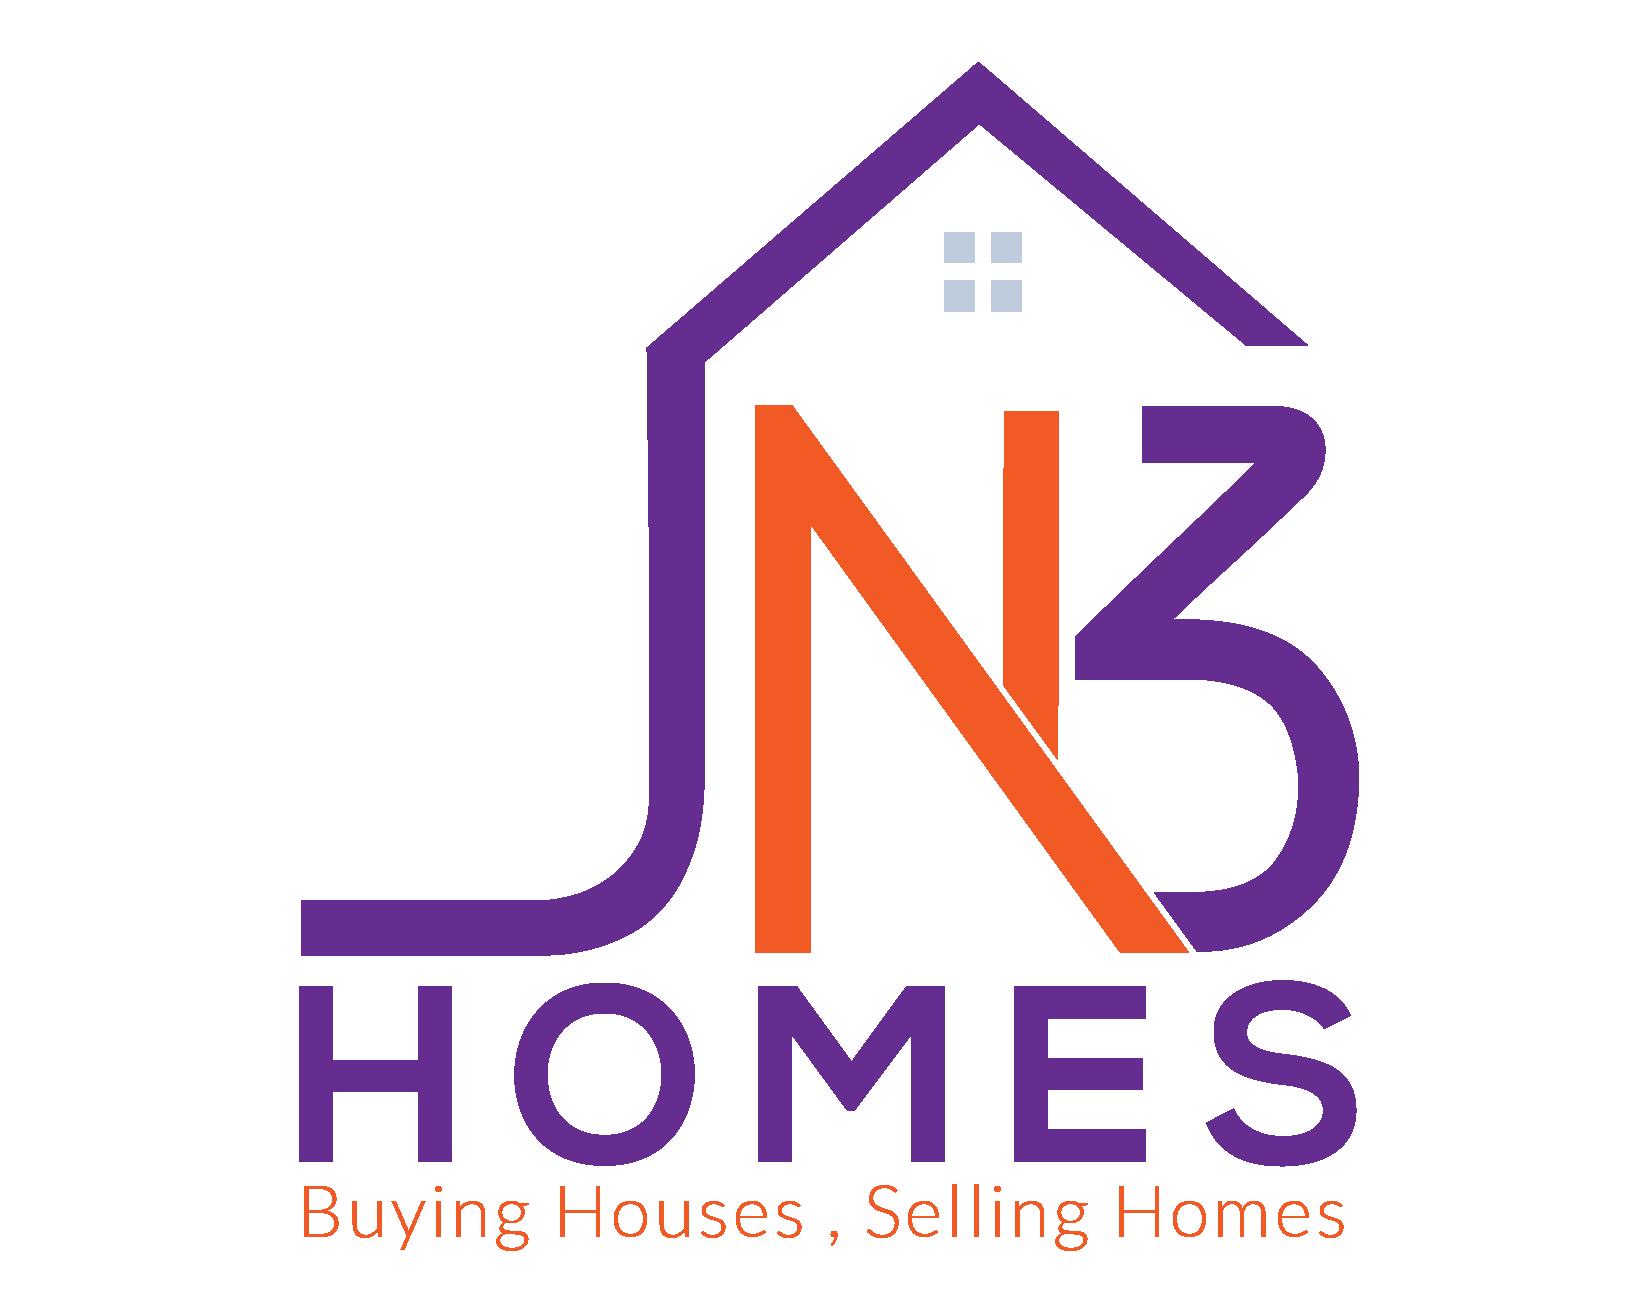 JN3 Homes